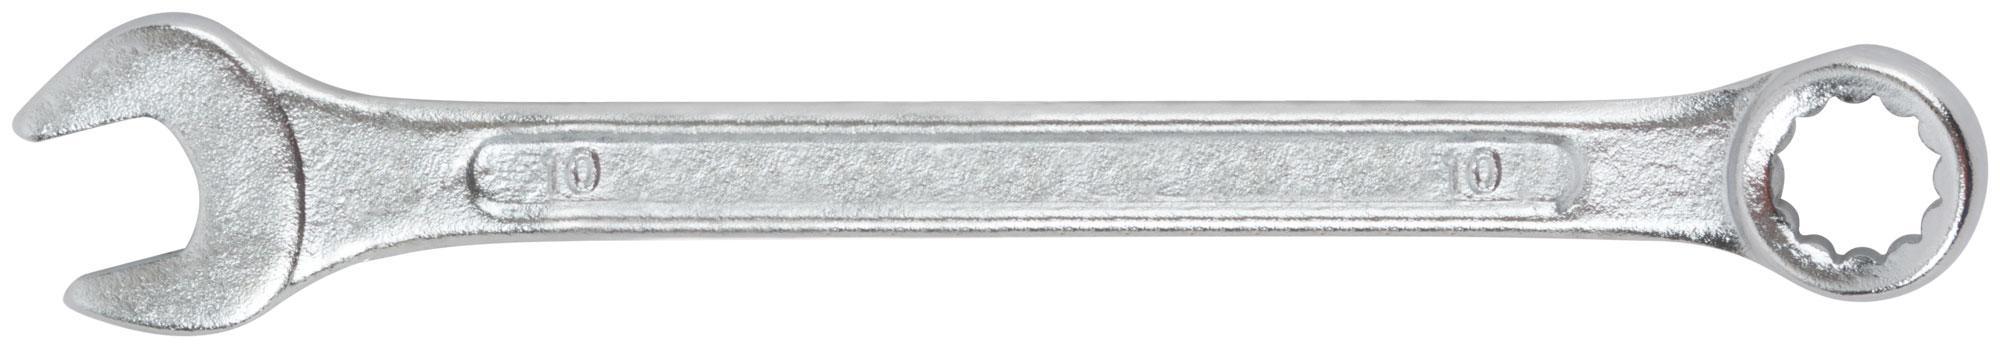 Ключ Fit 63140 (10 мм)